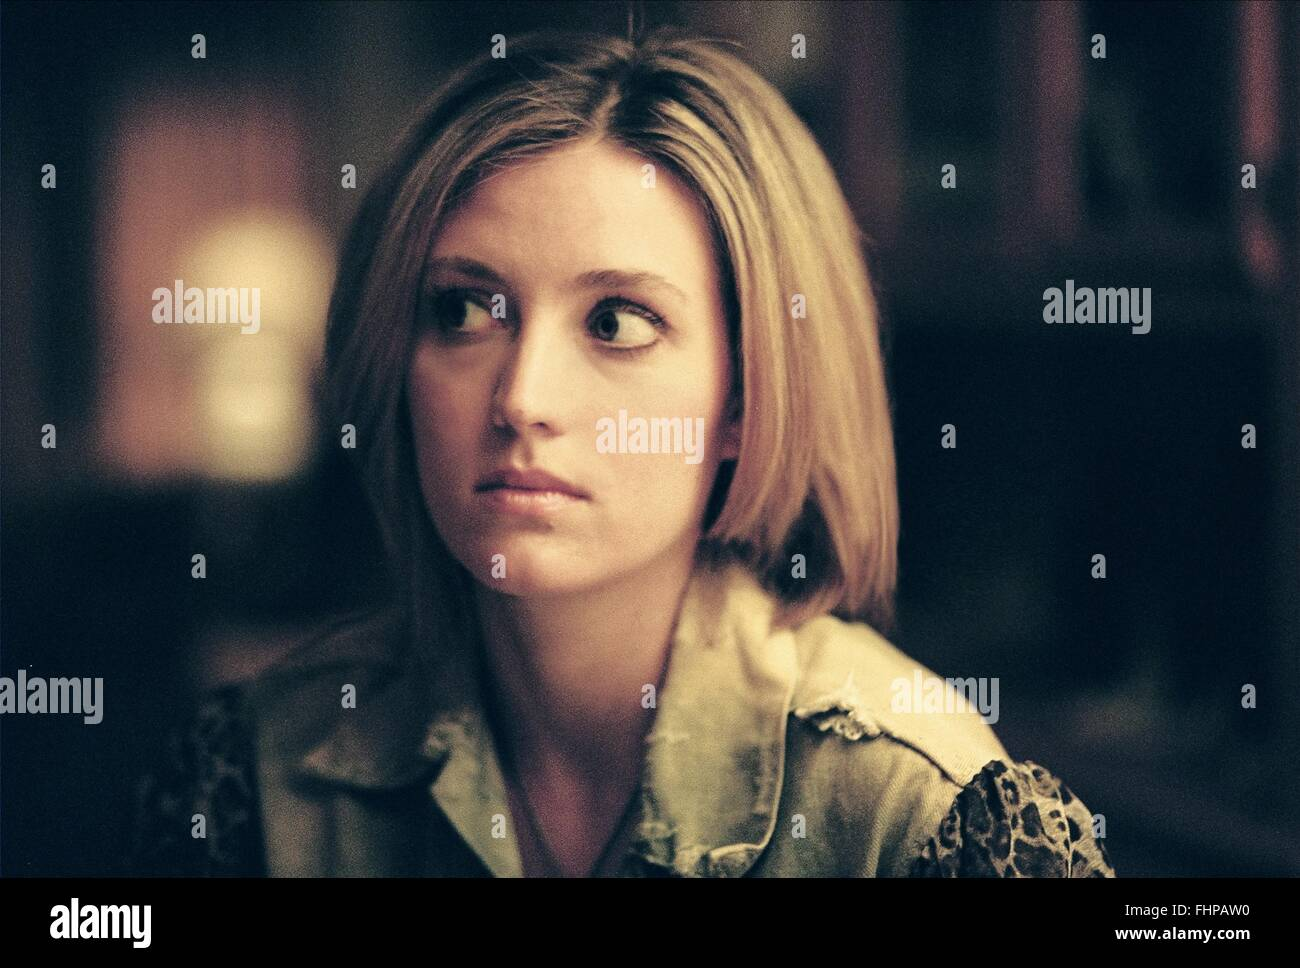 Watch Tiffany Mulheron (born 1984) video